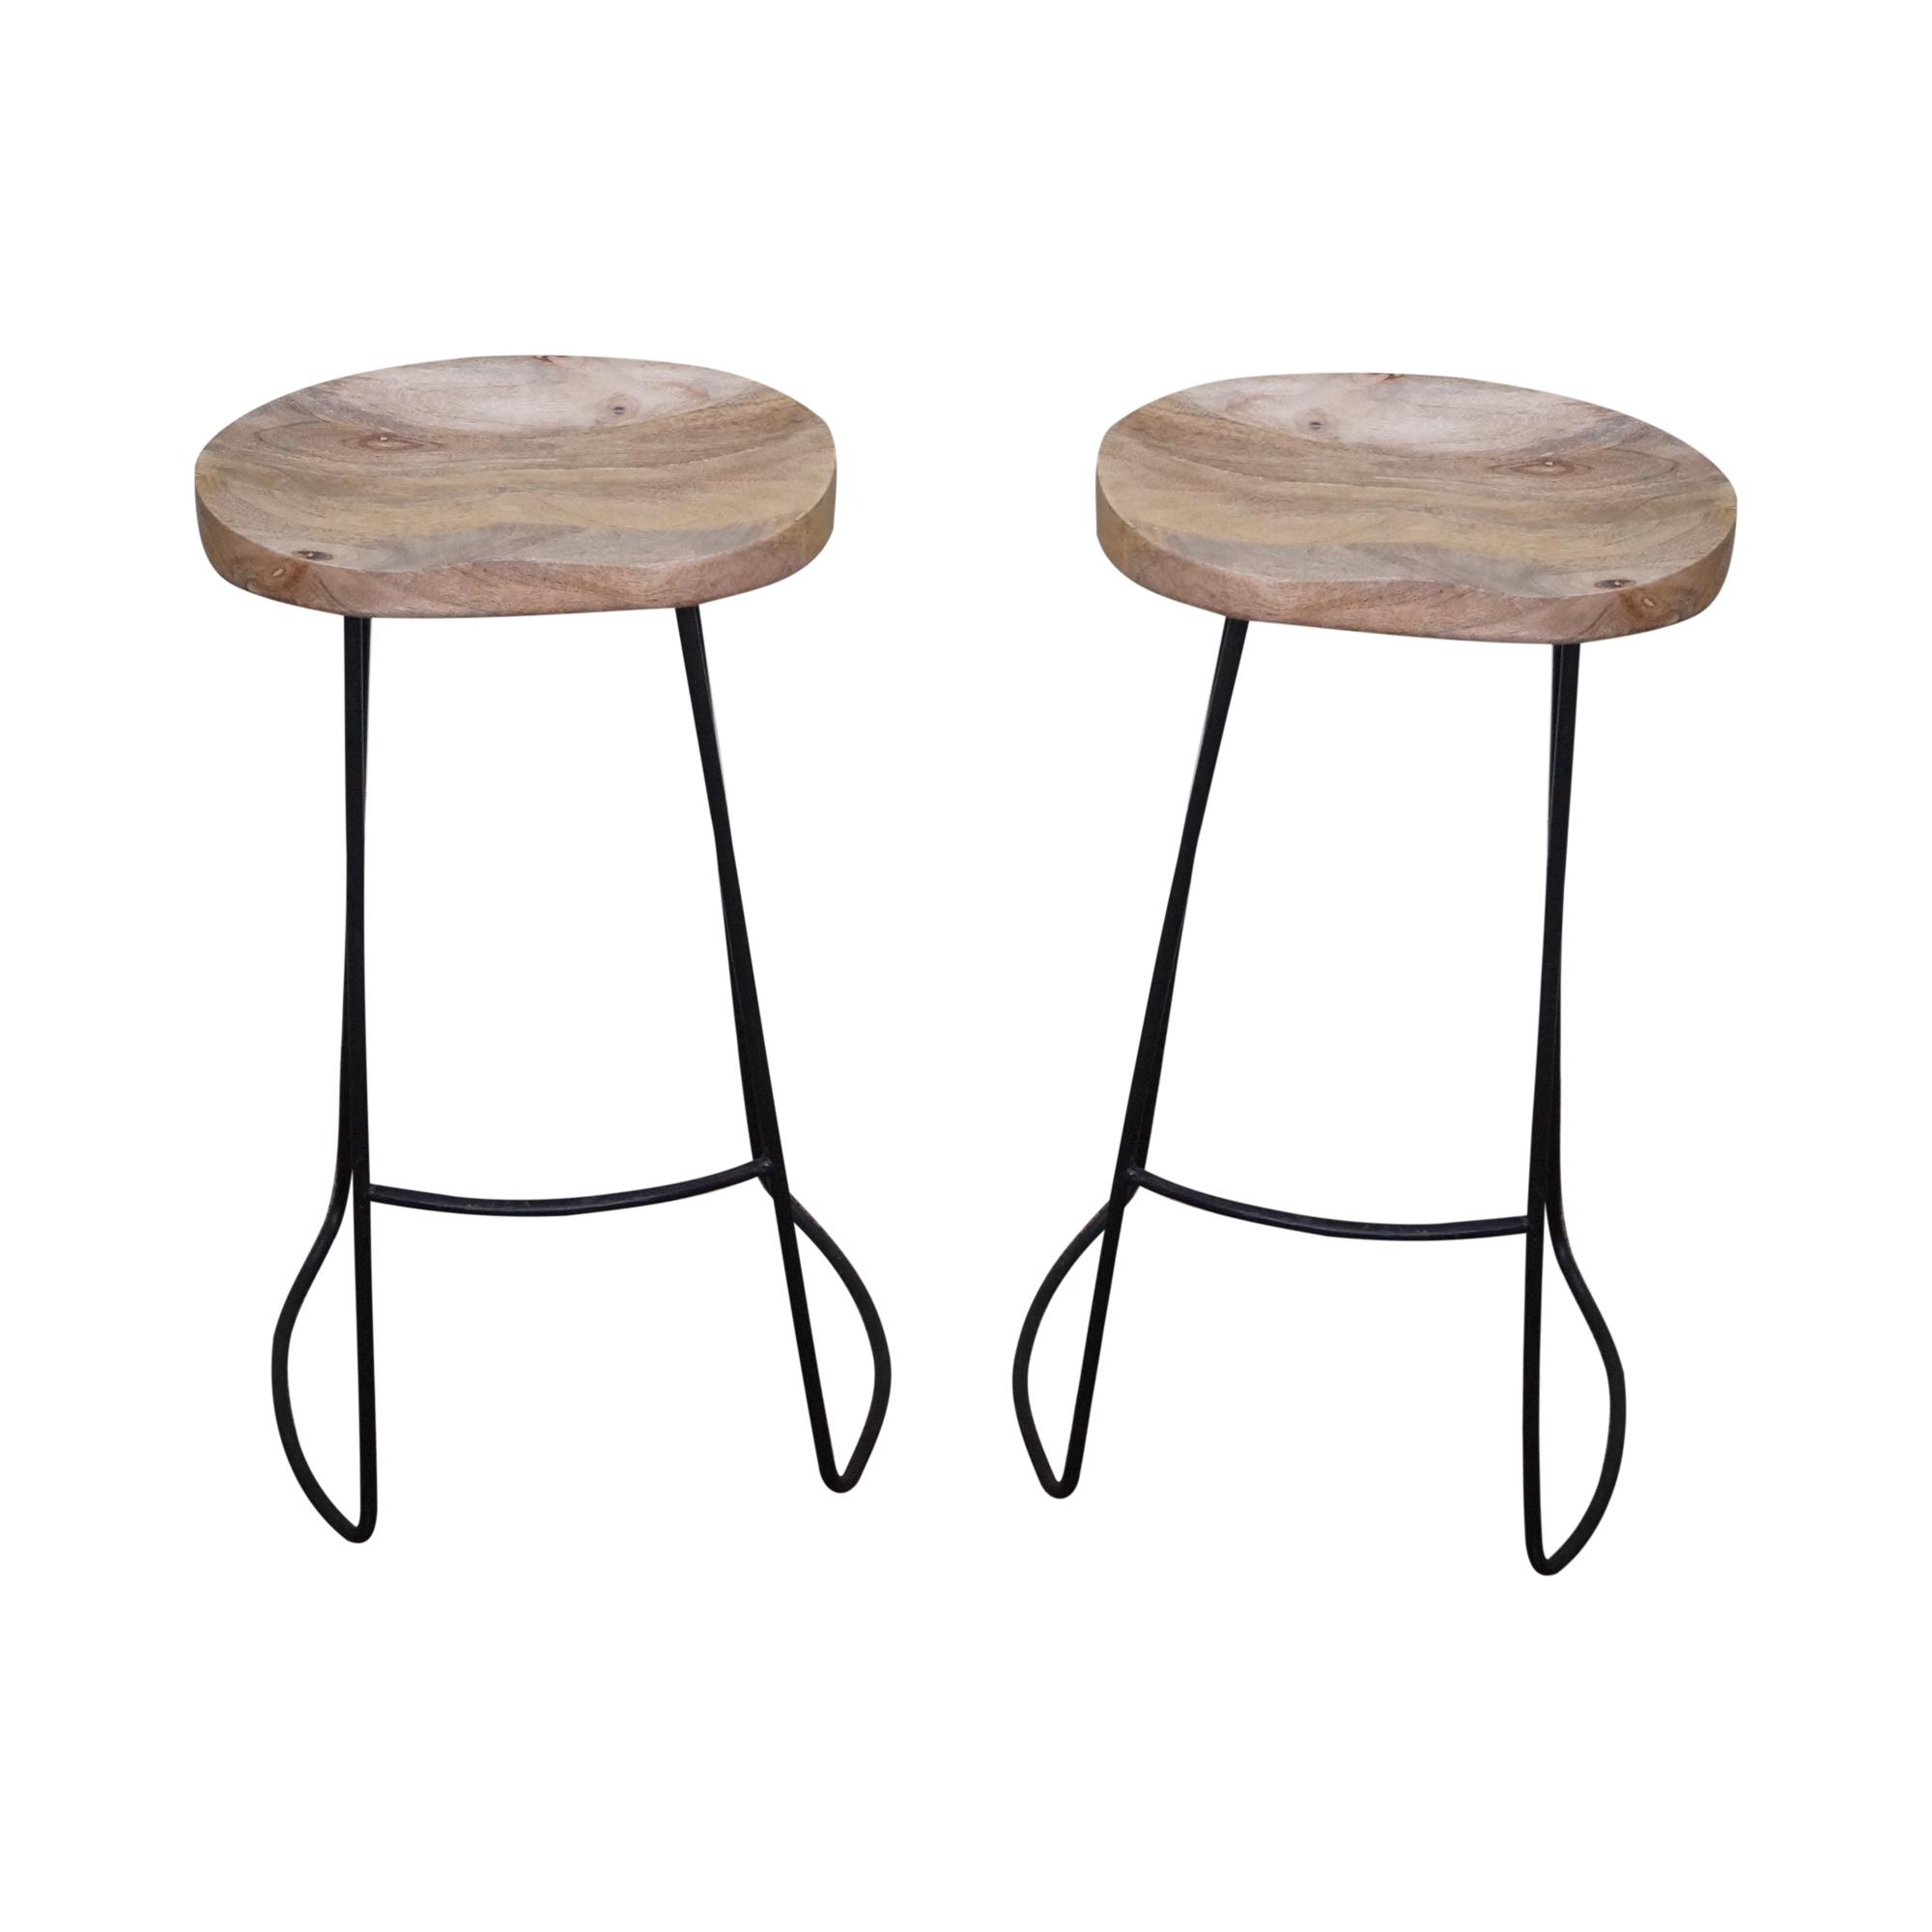 Image of mid century modern iron frame bar stools pair